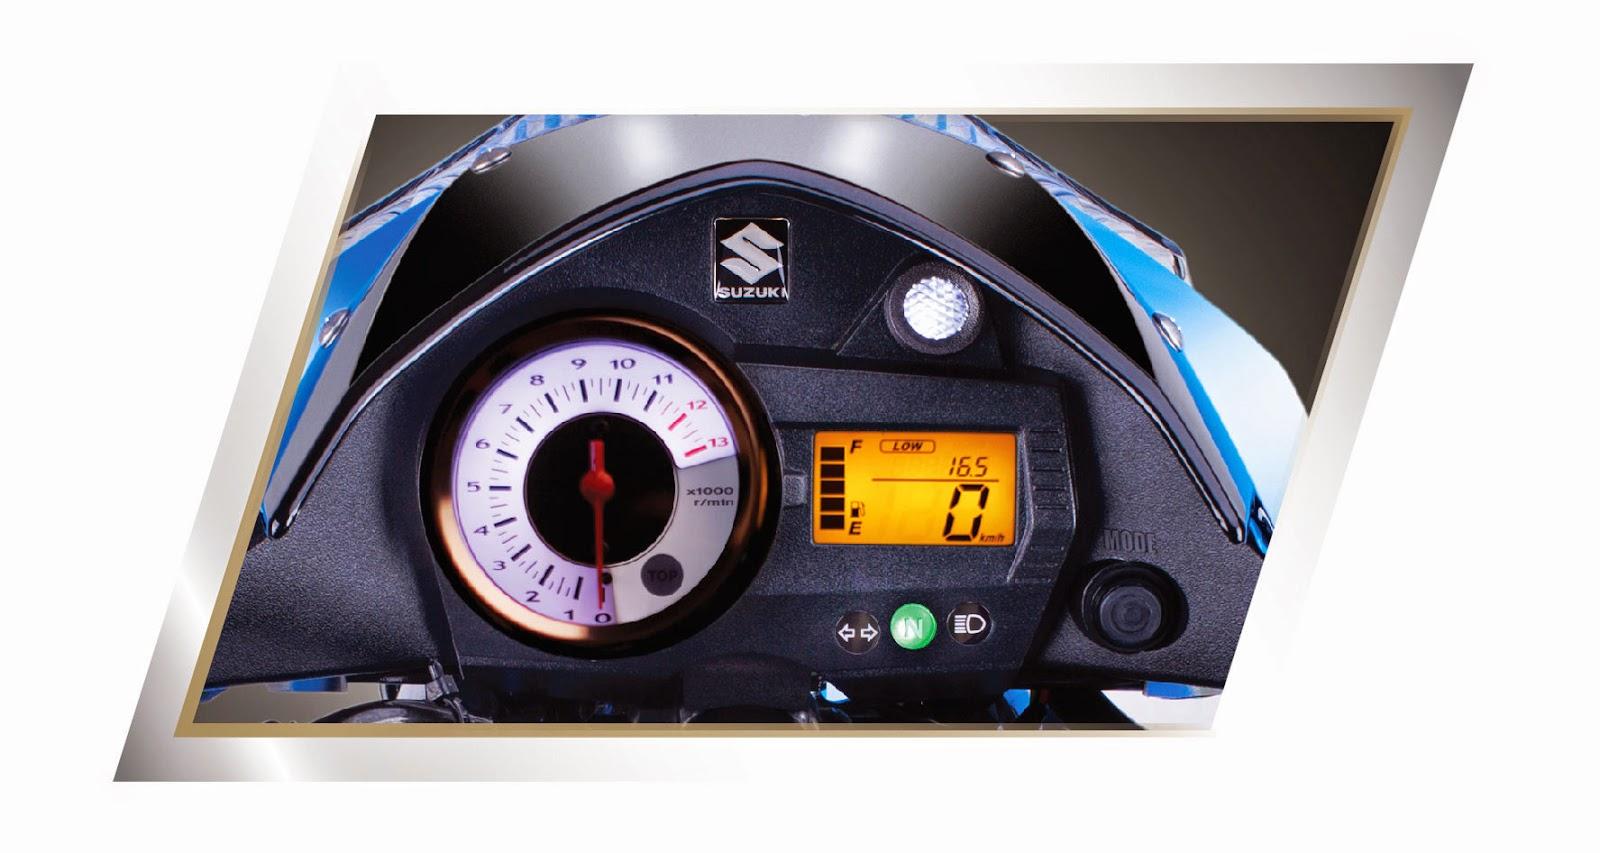 Mặt đồng hồ số của Suzuki Raider 150